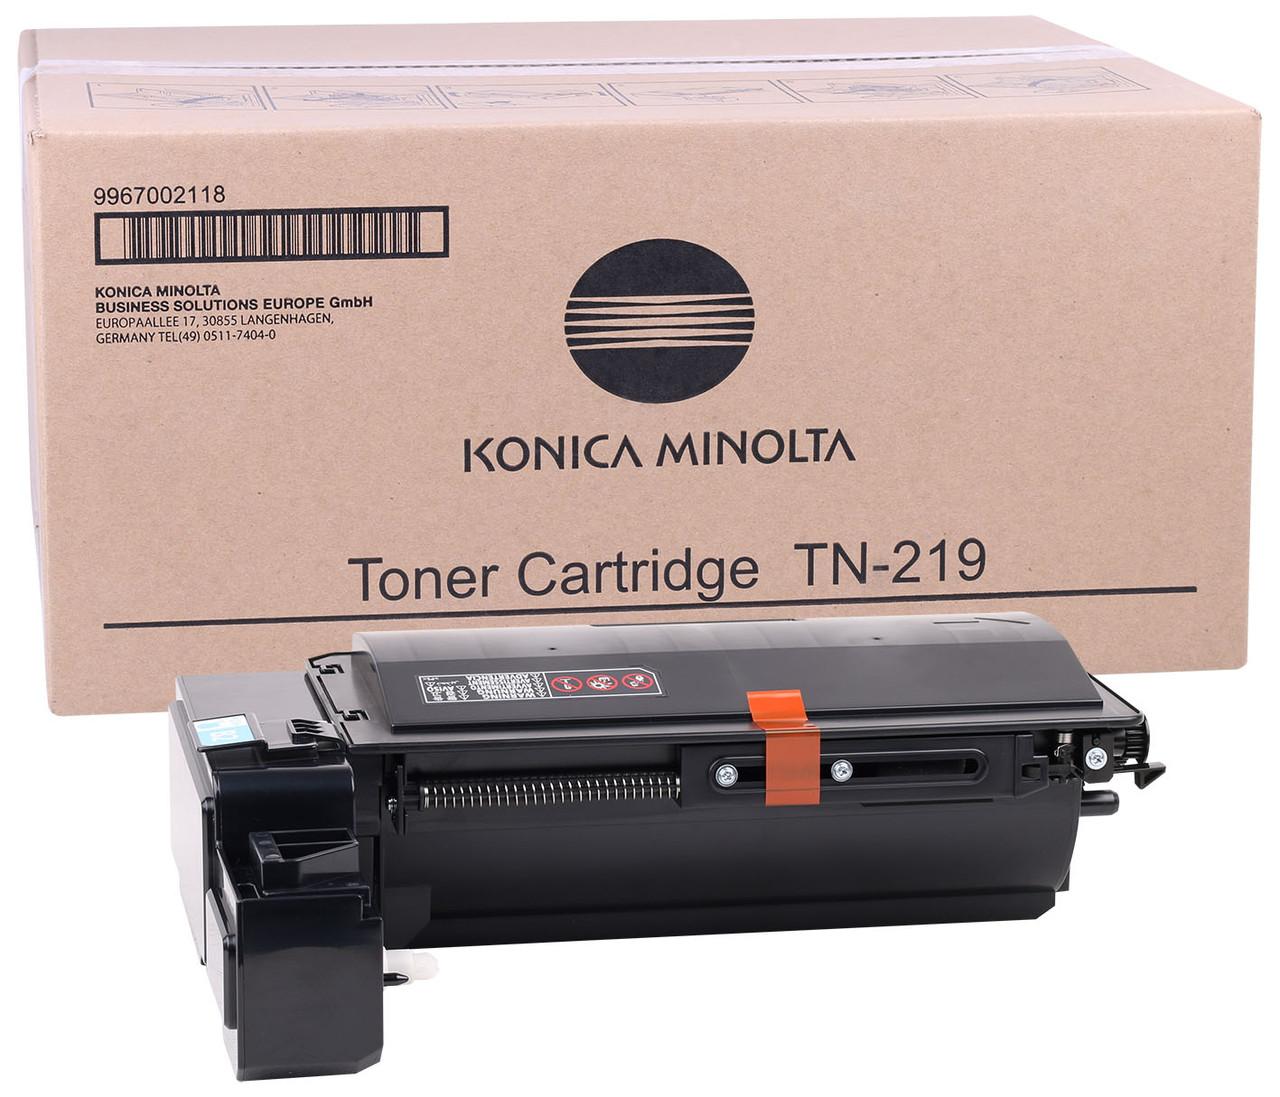 Тонер-картридж TN-219 Konica Minolta для модели bizhub 25e, 20 000 стр. @5%